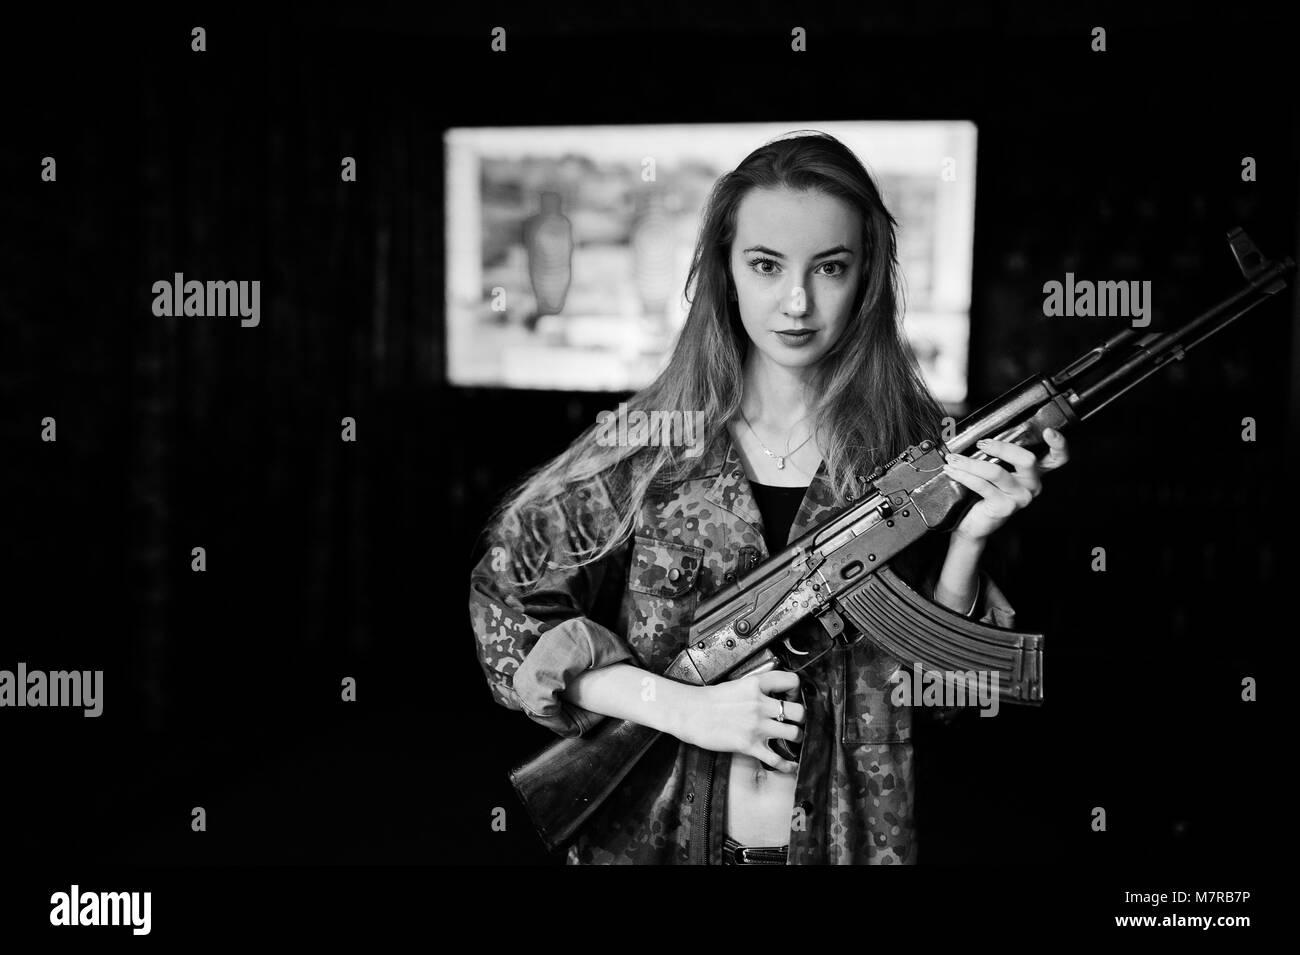 Girl with machine gun at hands on shooting range. - Stock Image